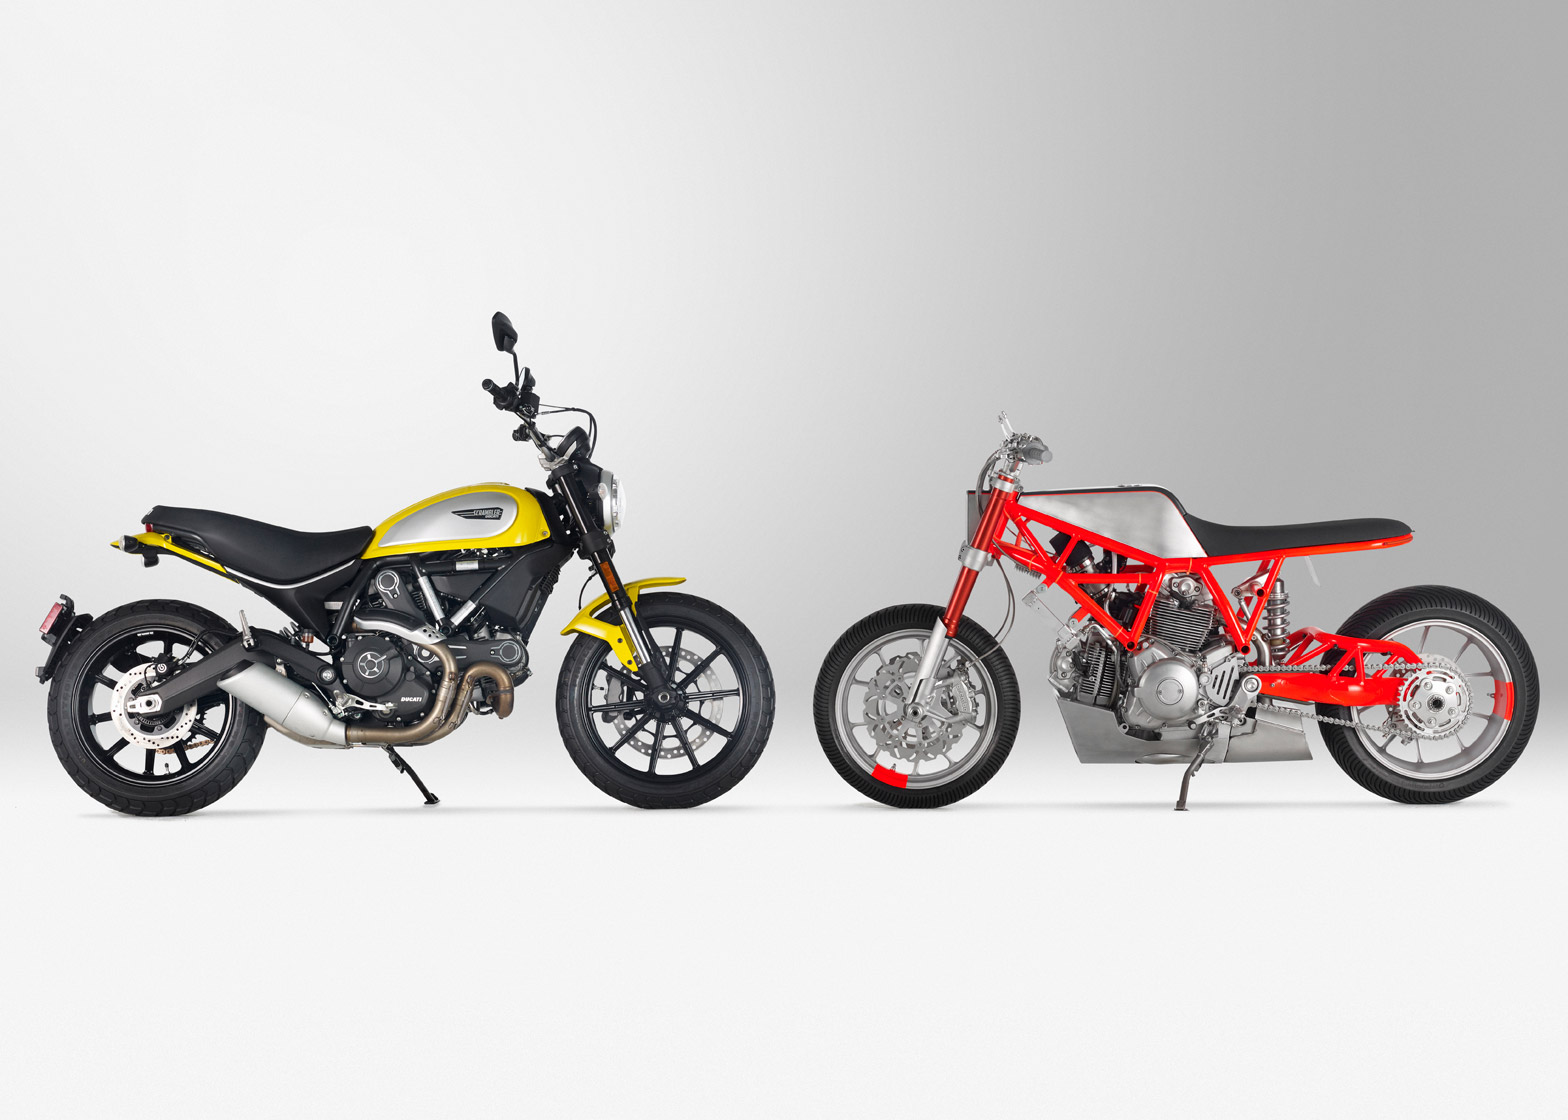 Ducati's 2015 Scrambler (left) compared to UMC-SF's customised version, the UMC-038 Marin Ducati Scrambler Icon